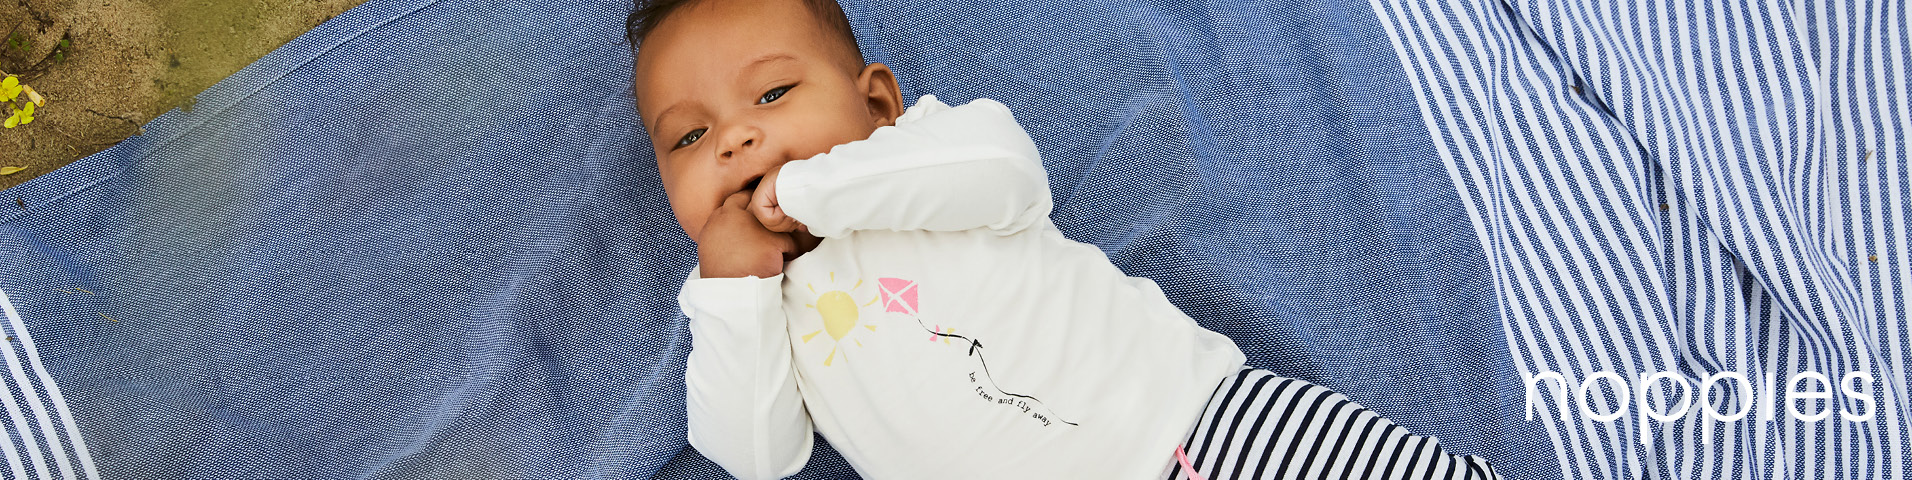 Noppies Baby Und Kinder Unisex Langarmshirt Amanda